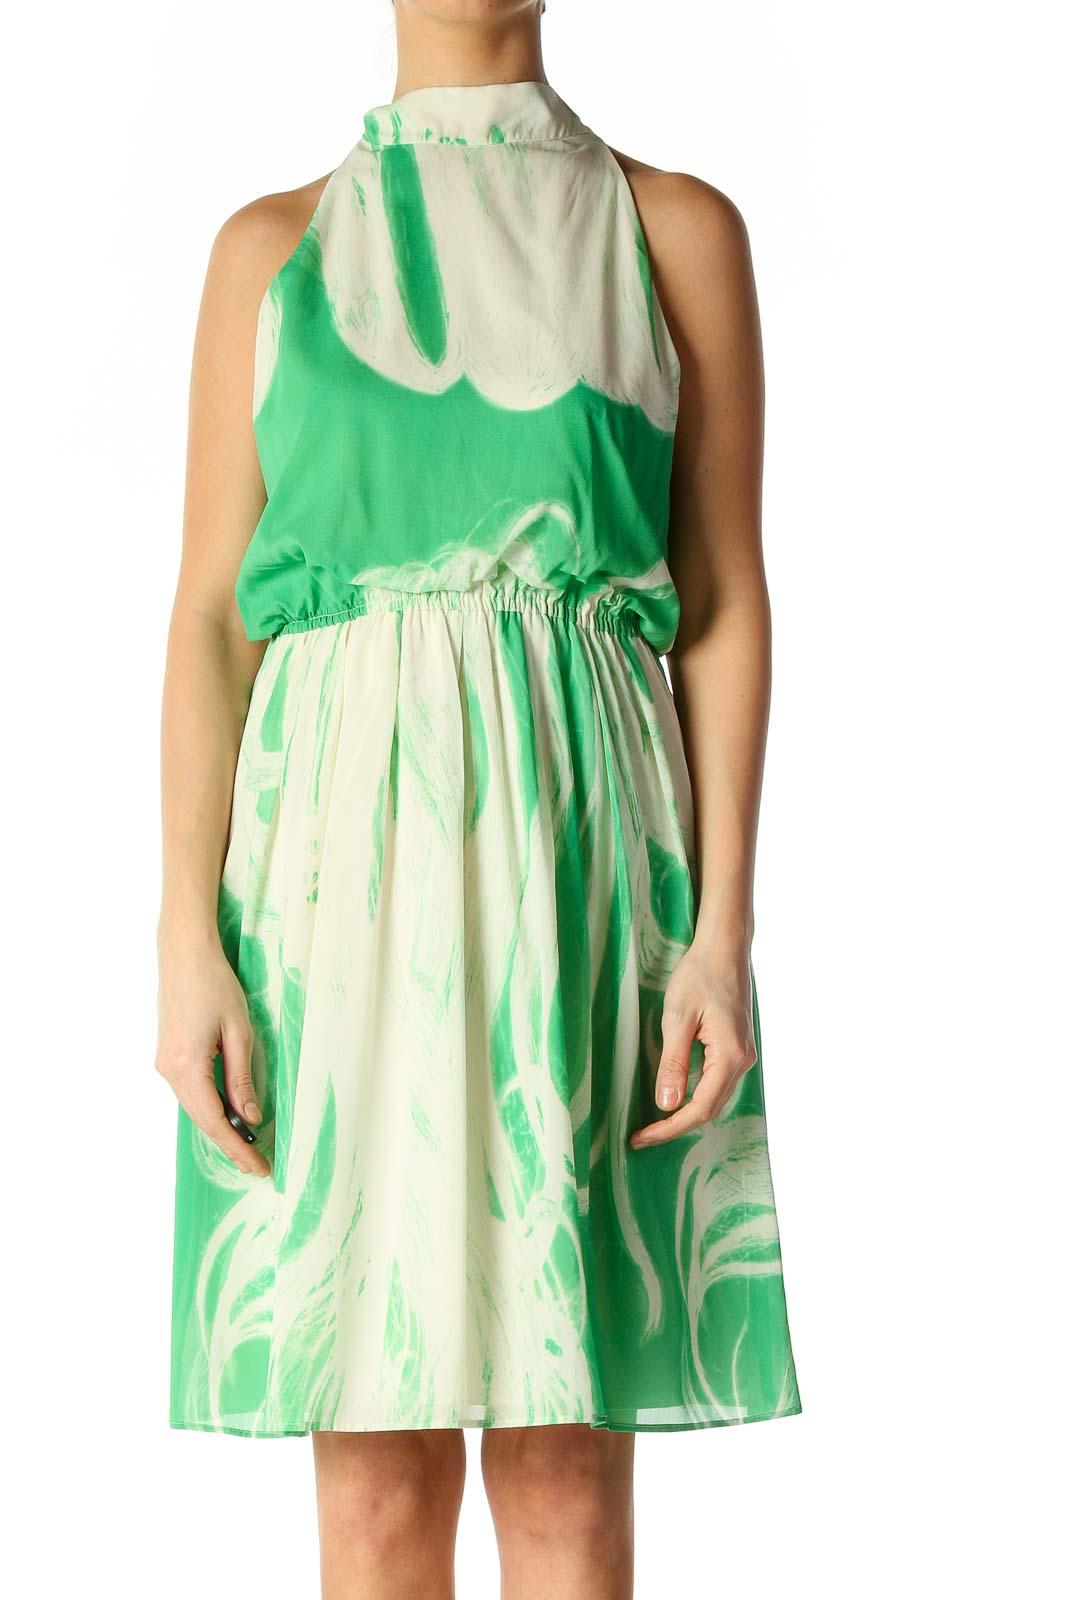 Beige Solid Retro A-Line Dress Front